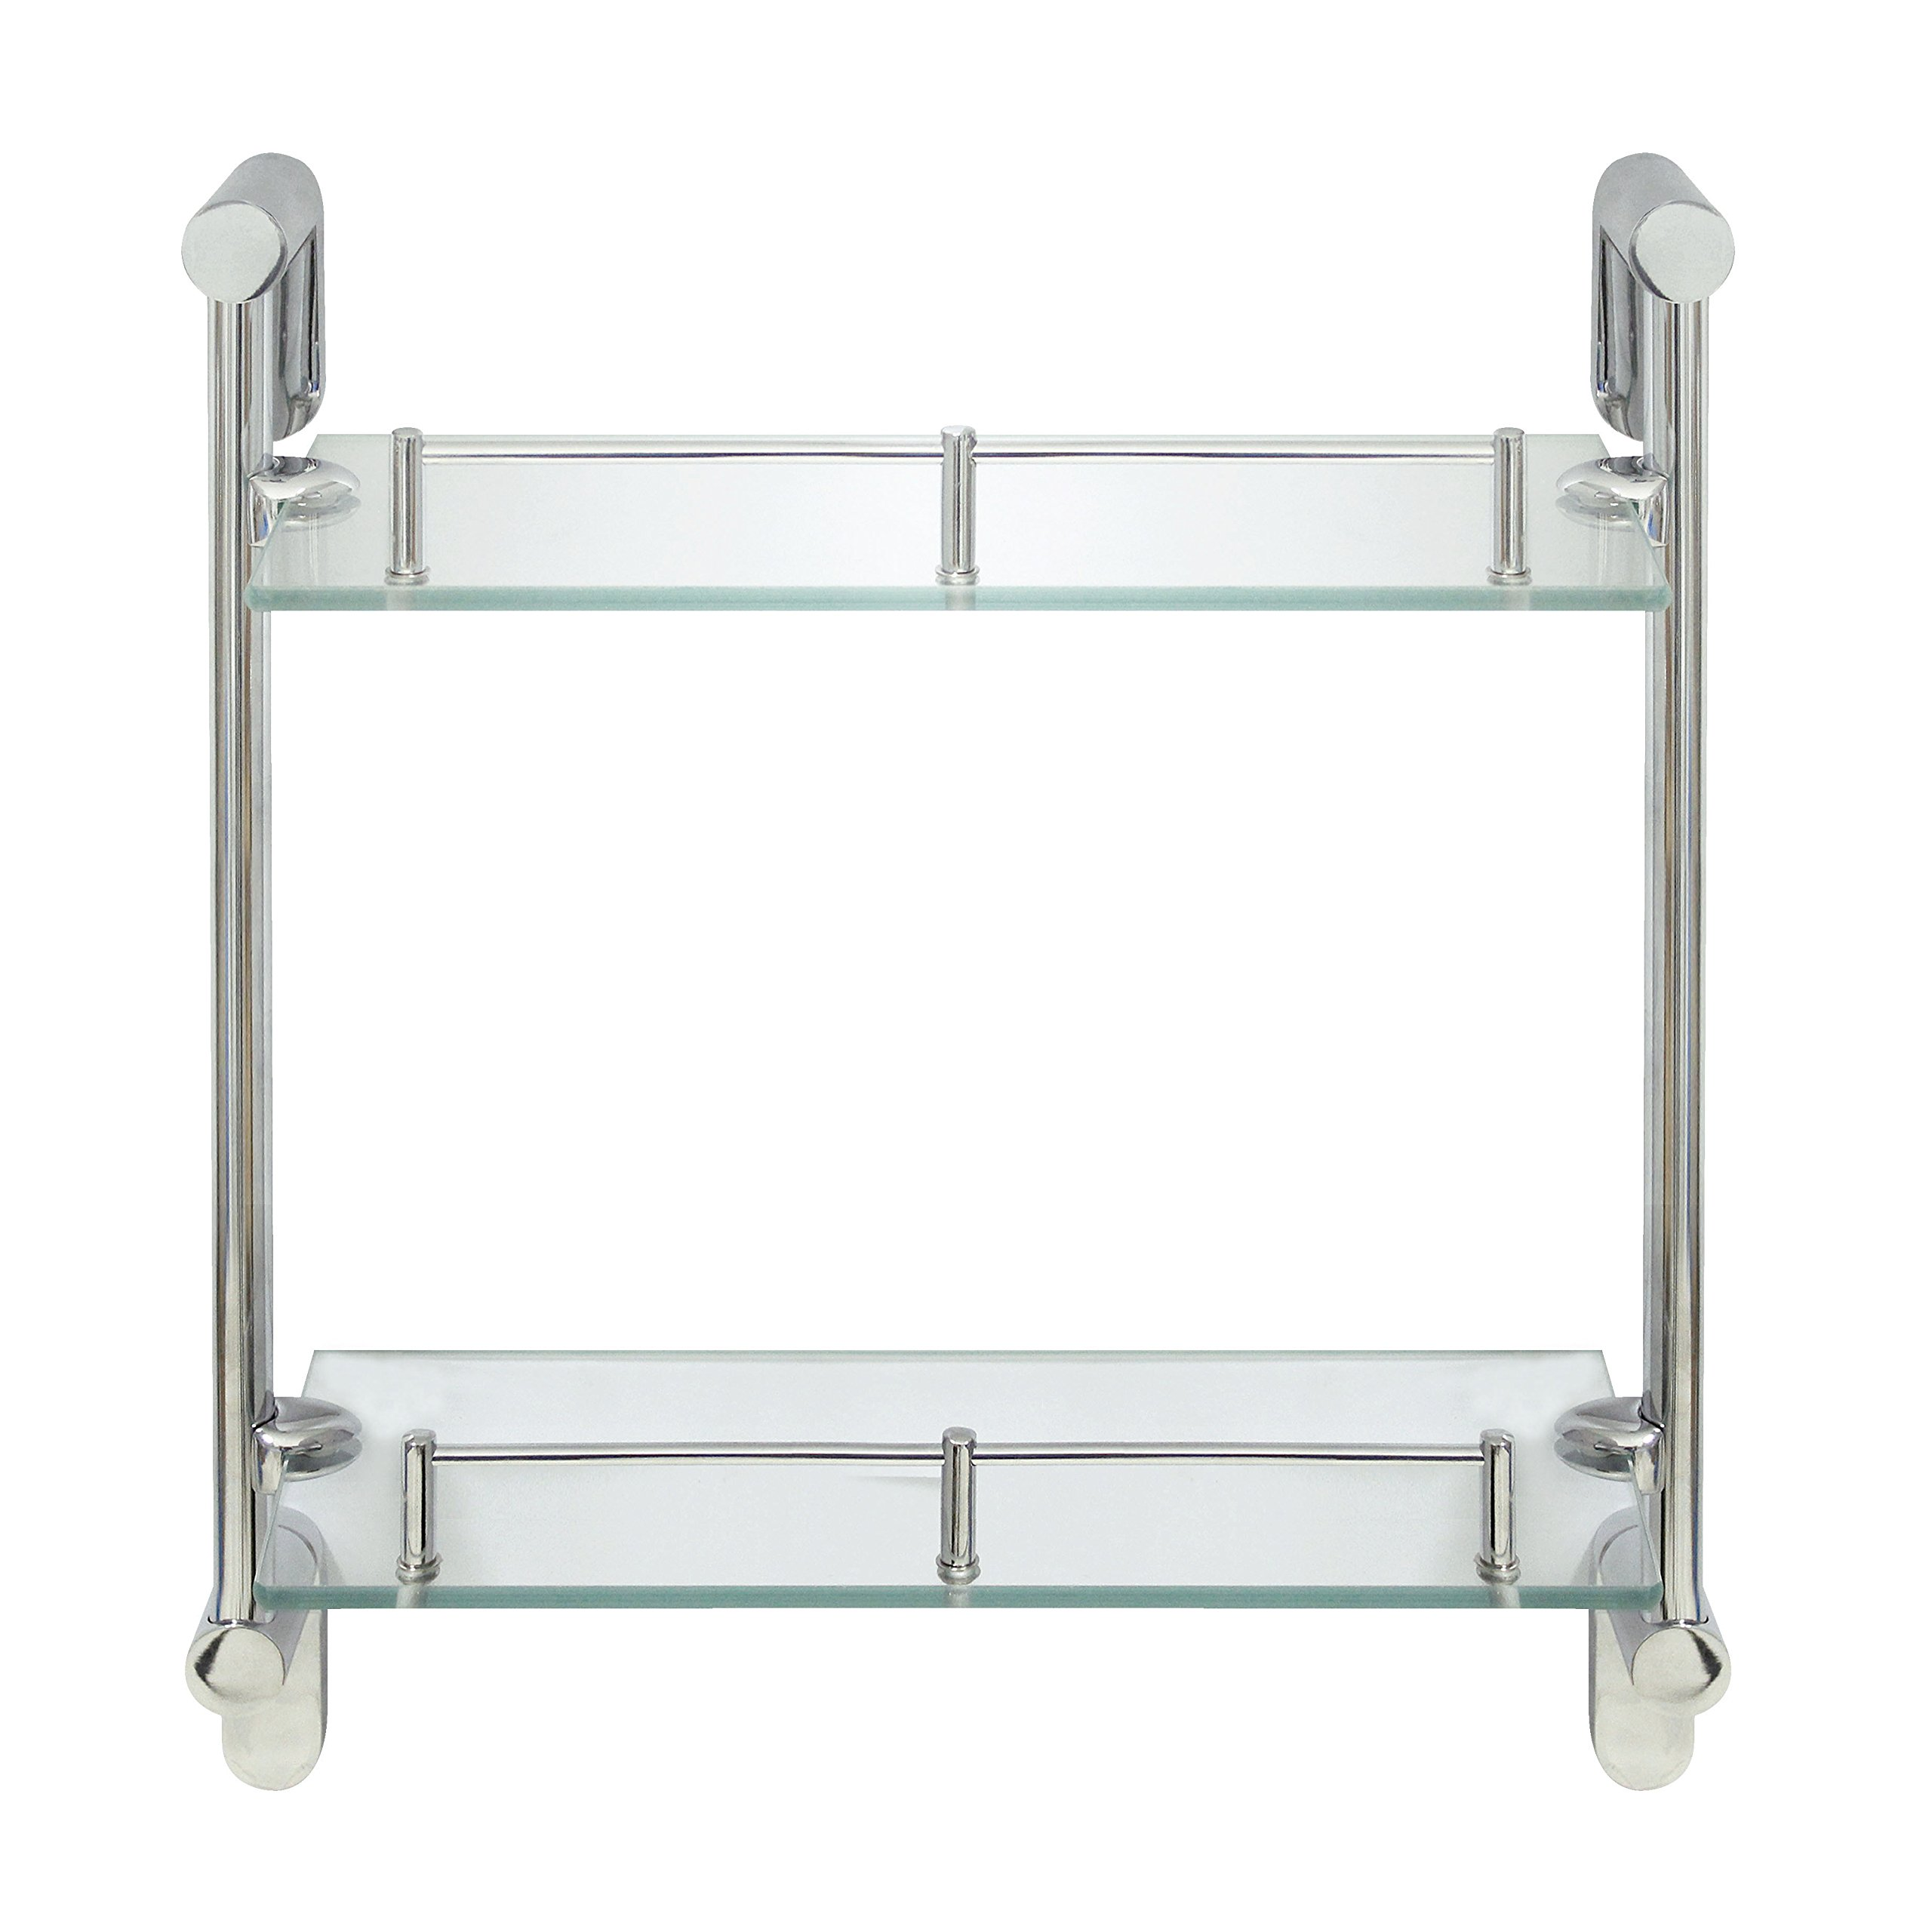 MODONA Double Wall Glass Shelf with Pre-installed Rail - POLISHED CHROME - Oval Series - 5 Year Warrantee by MODONA